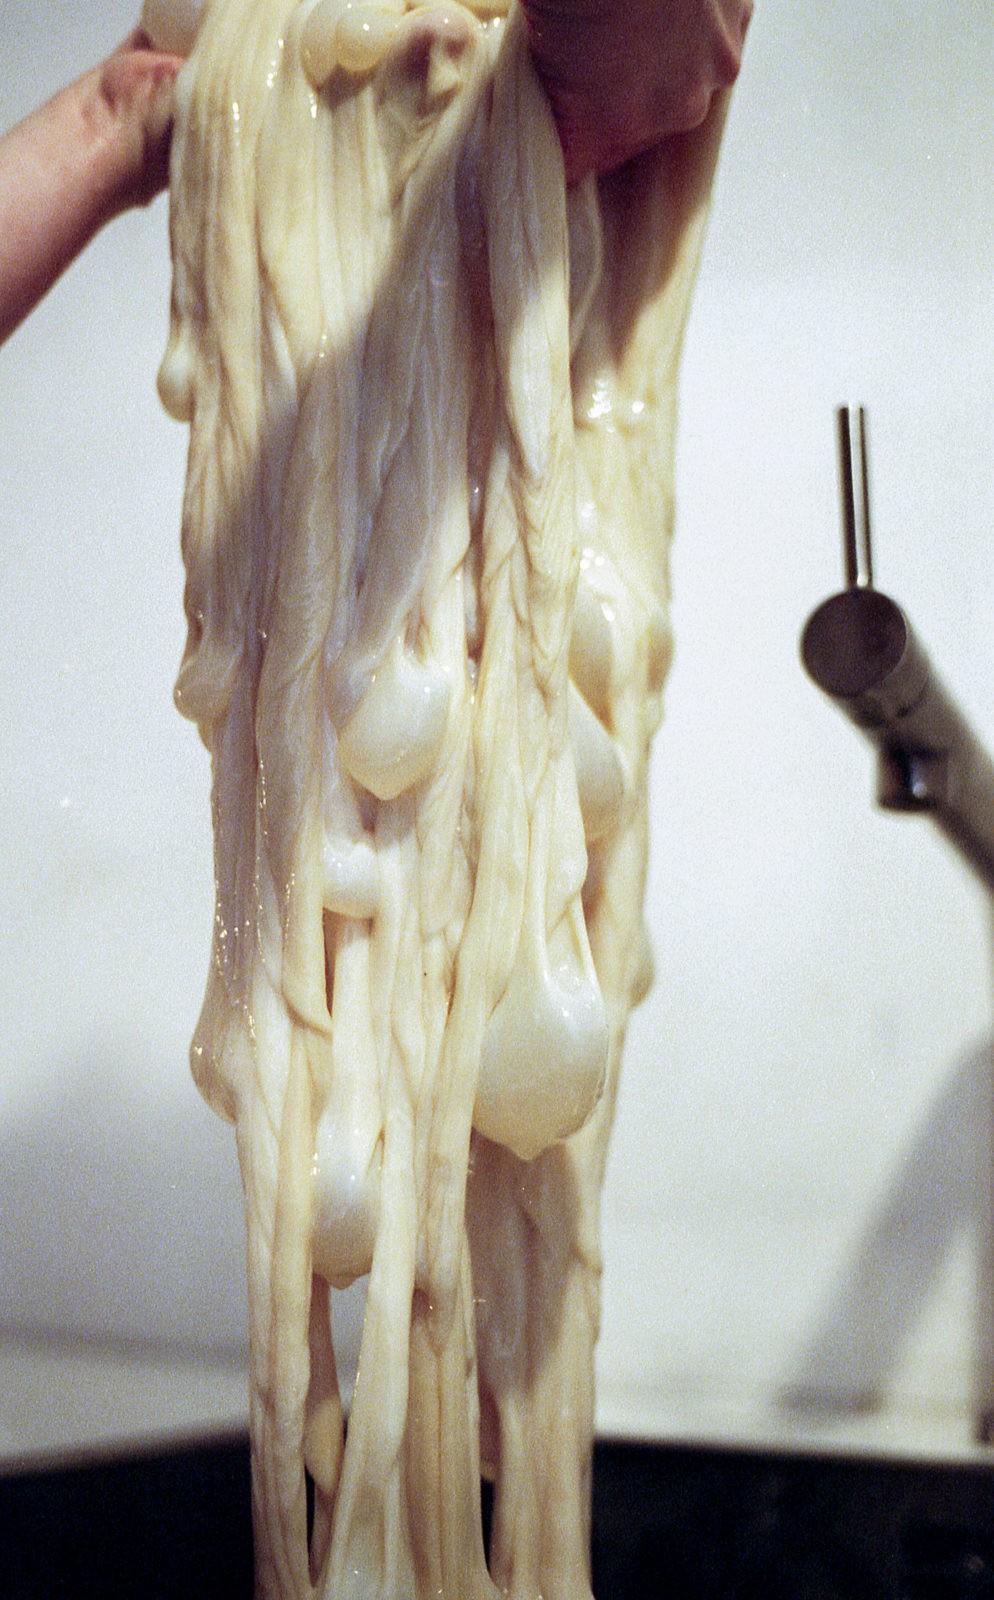 Лампа из коровьего кишечника. Ужасно или красиво?